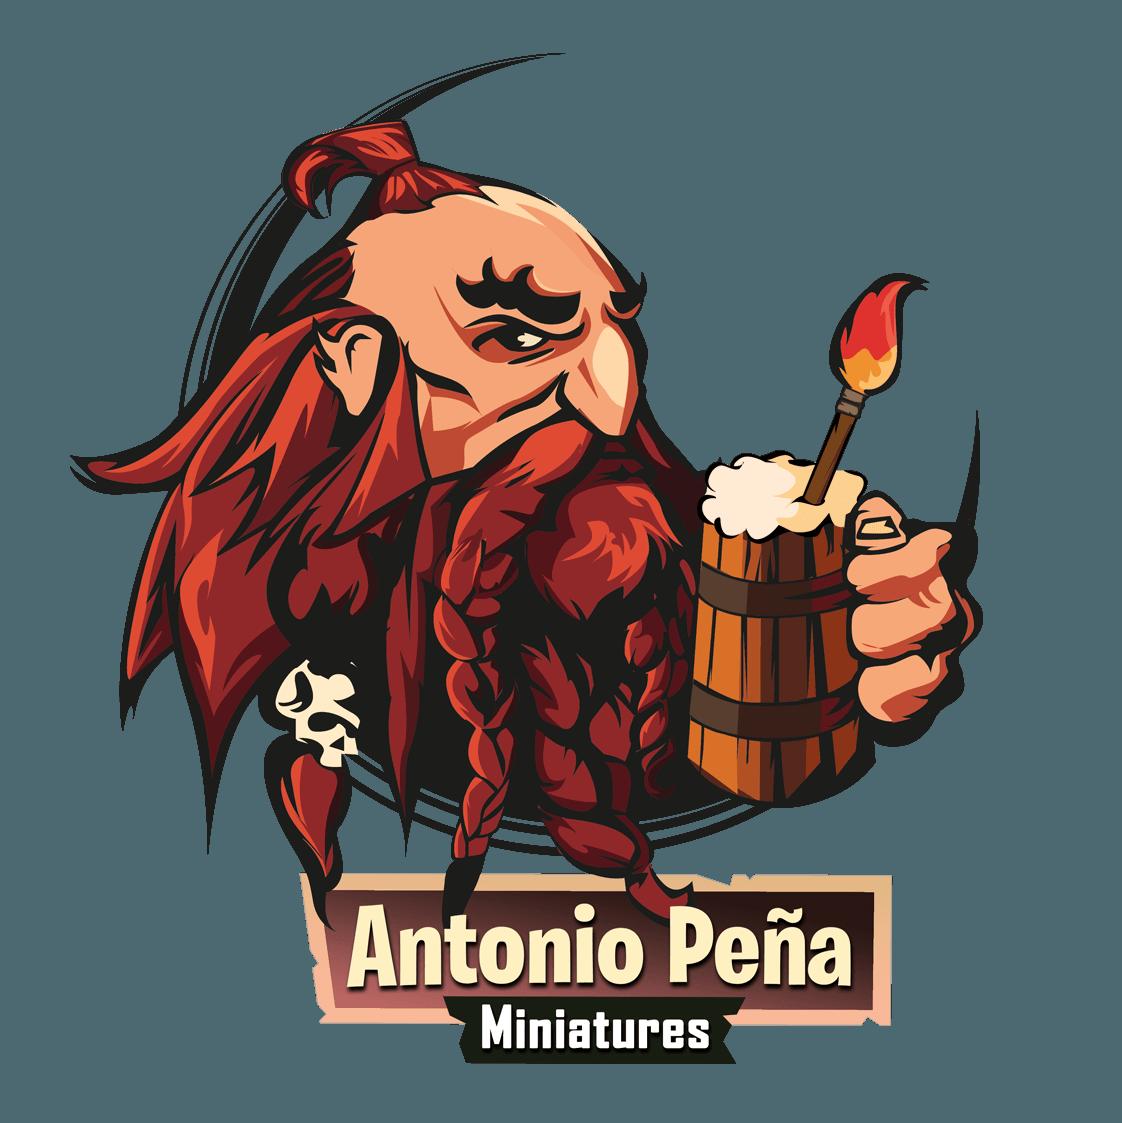 Antonio Peña Miniatures